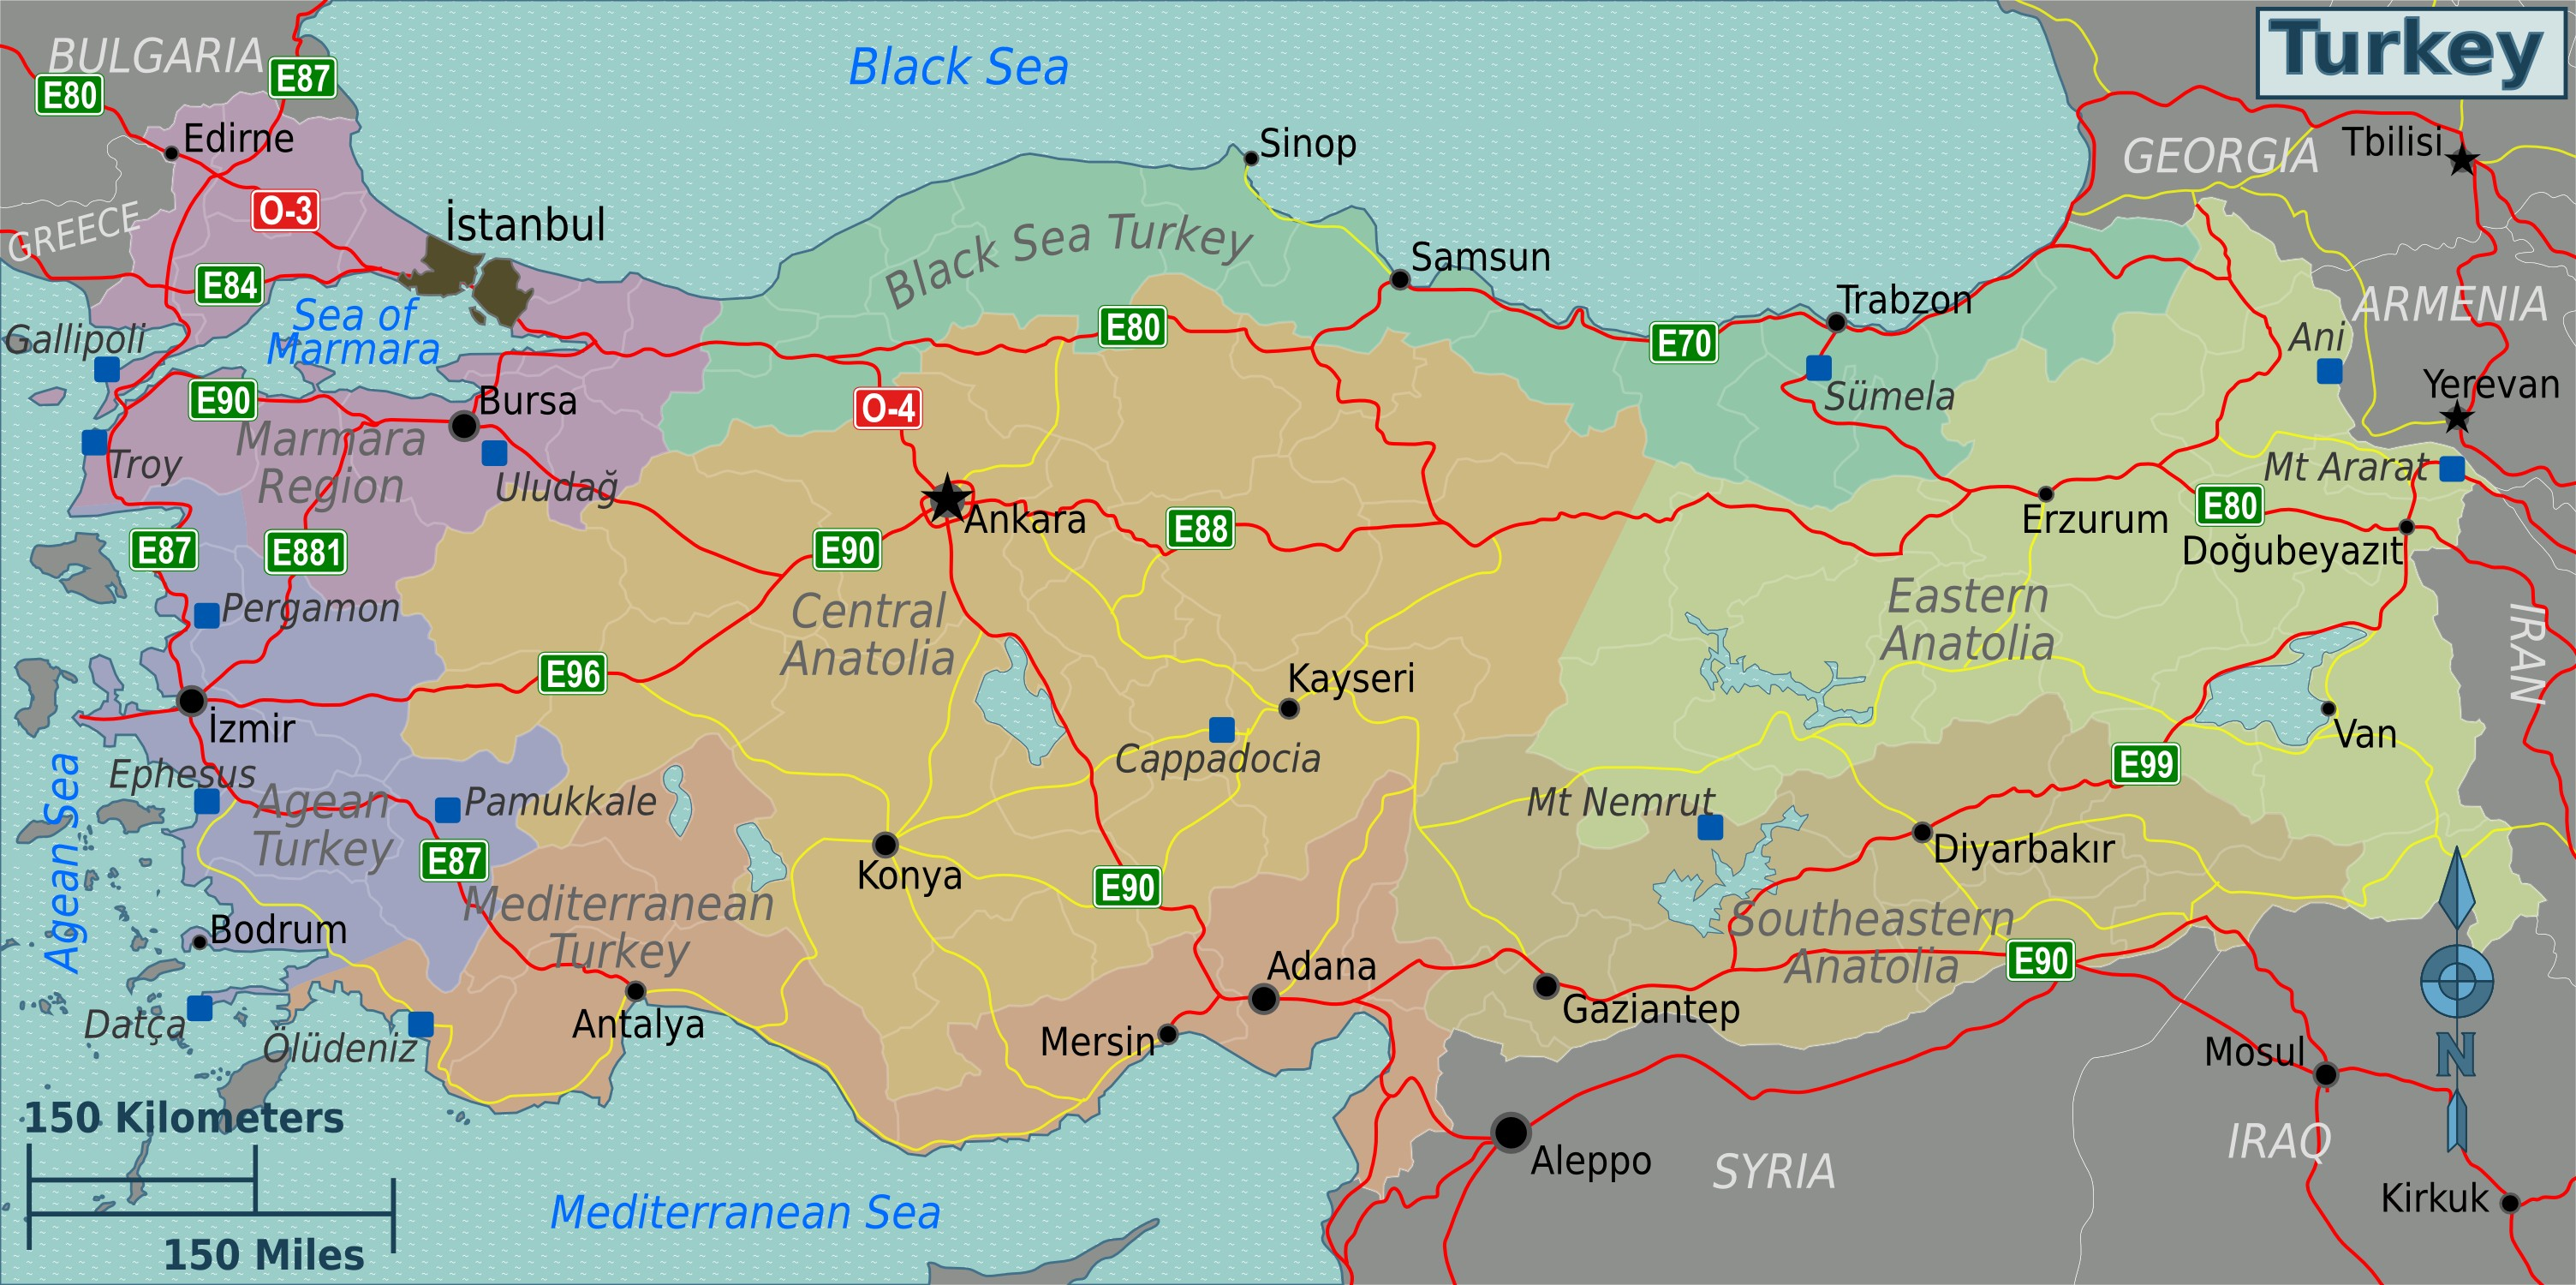 Karte Türkei Kappadokien.Kappadokien Türkei Karte Hanzeontwerpfabriek